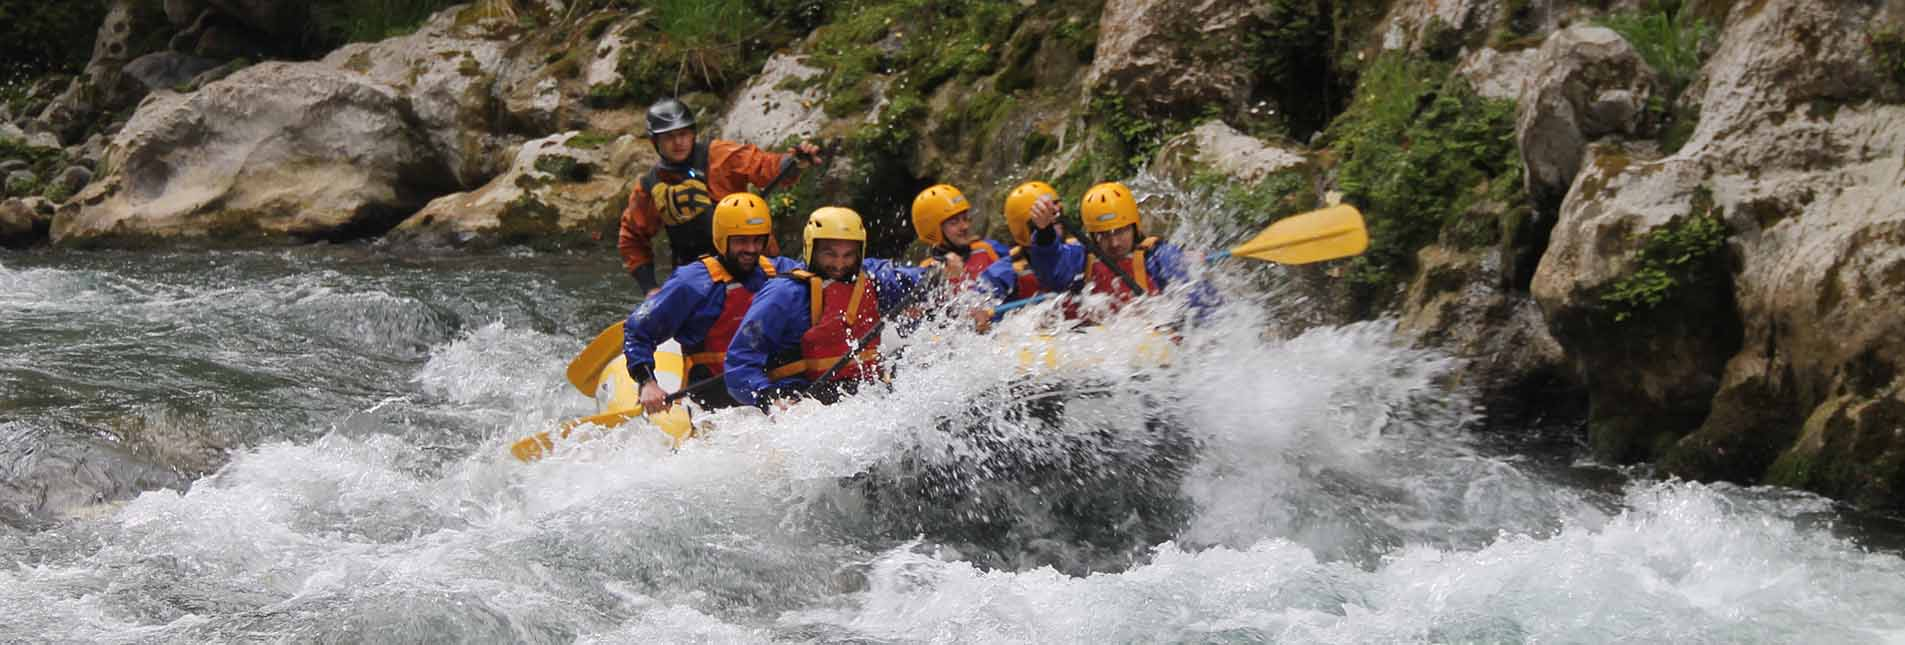 Rafting_Orsomarso